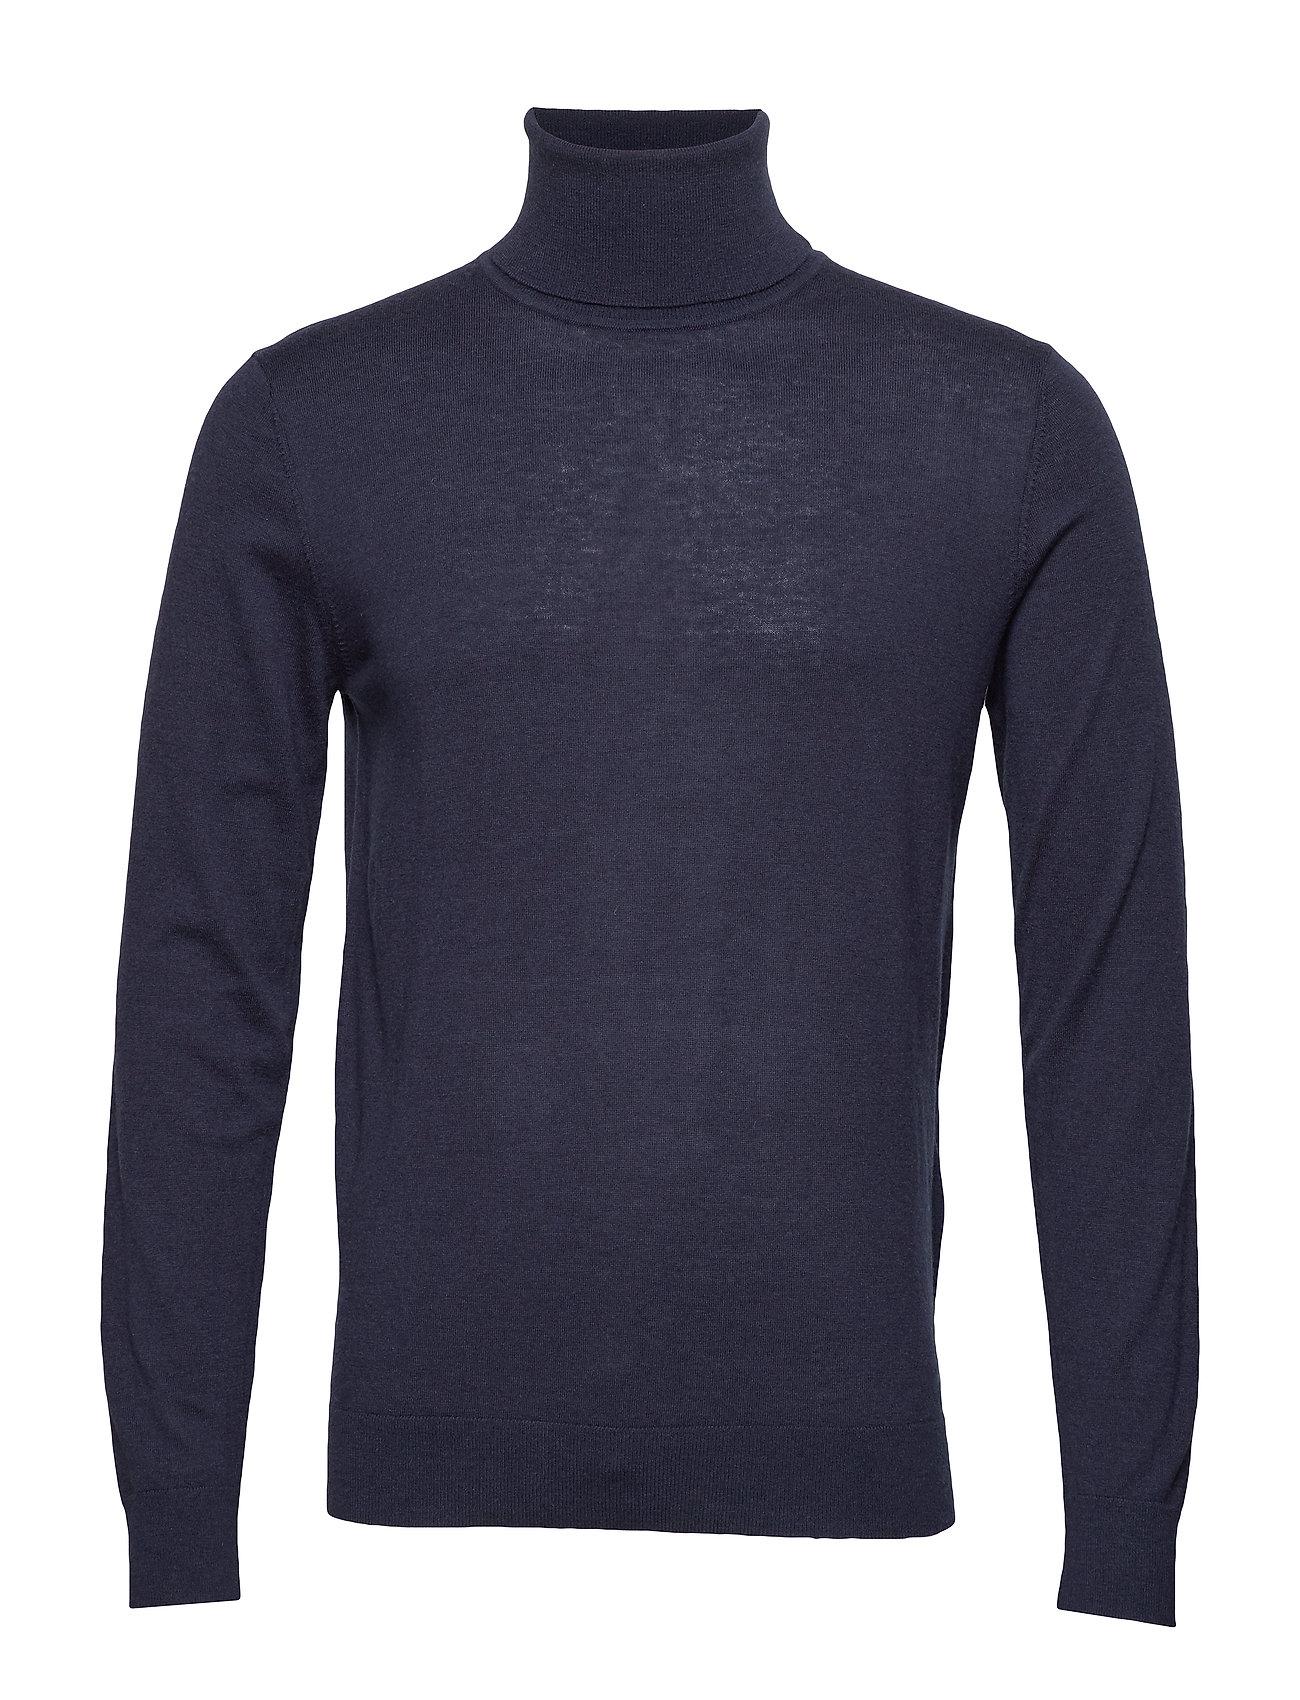 GANT O1. Merino Silk Turtle Neck Knitwear Turtlenecks Blau GANT